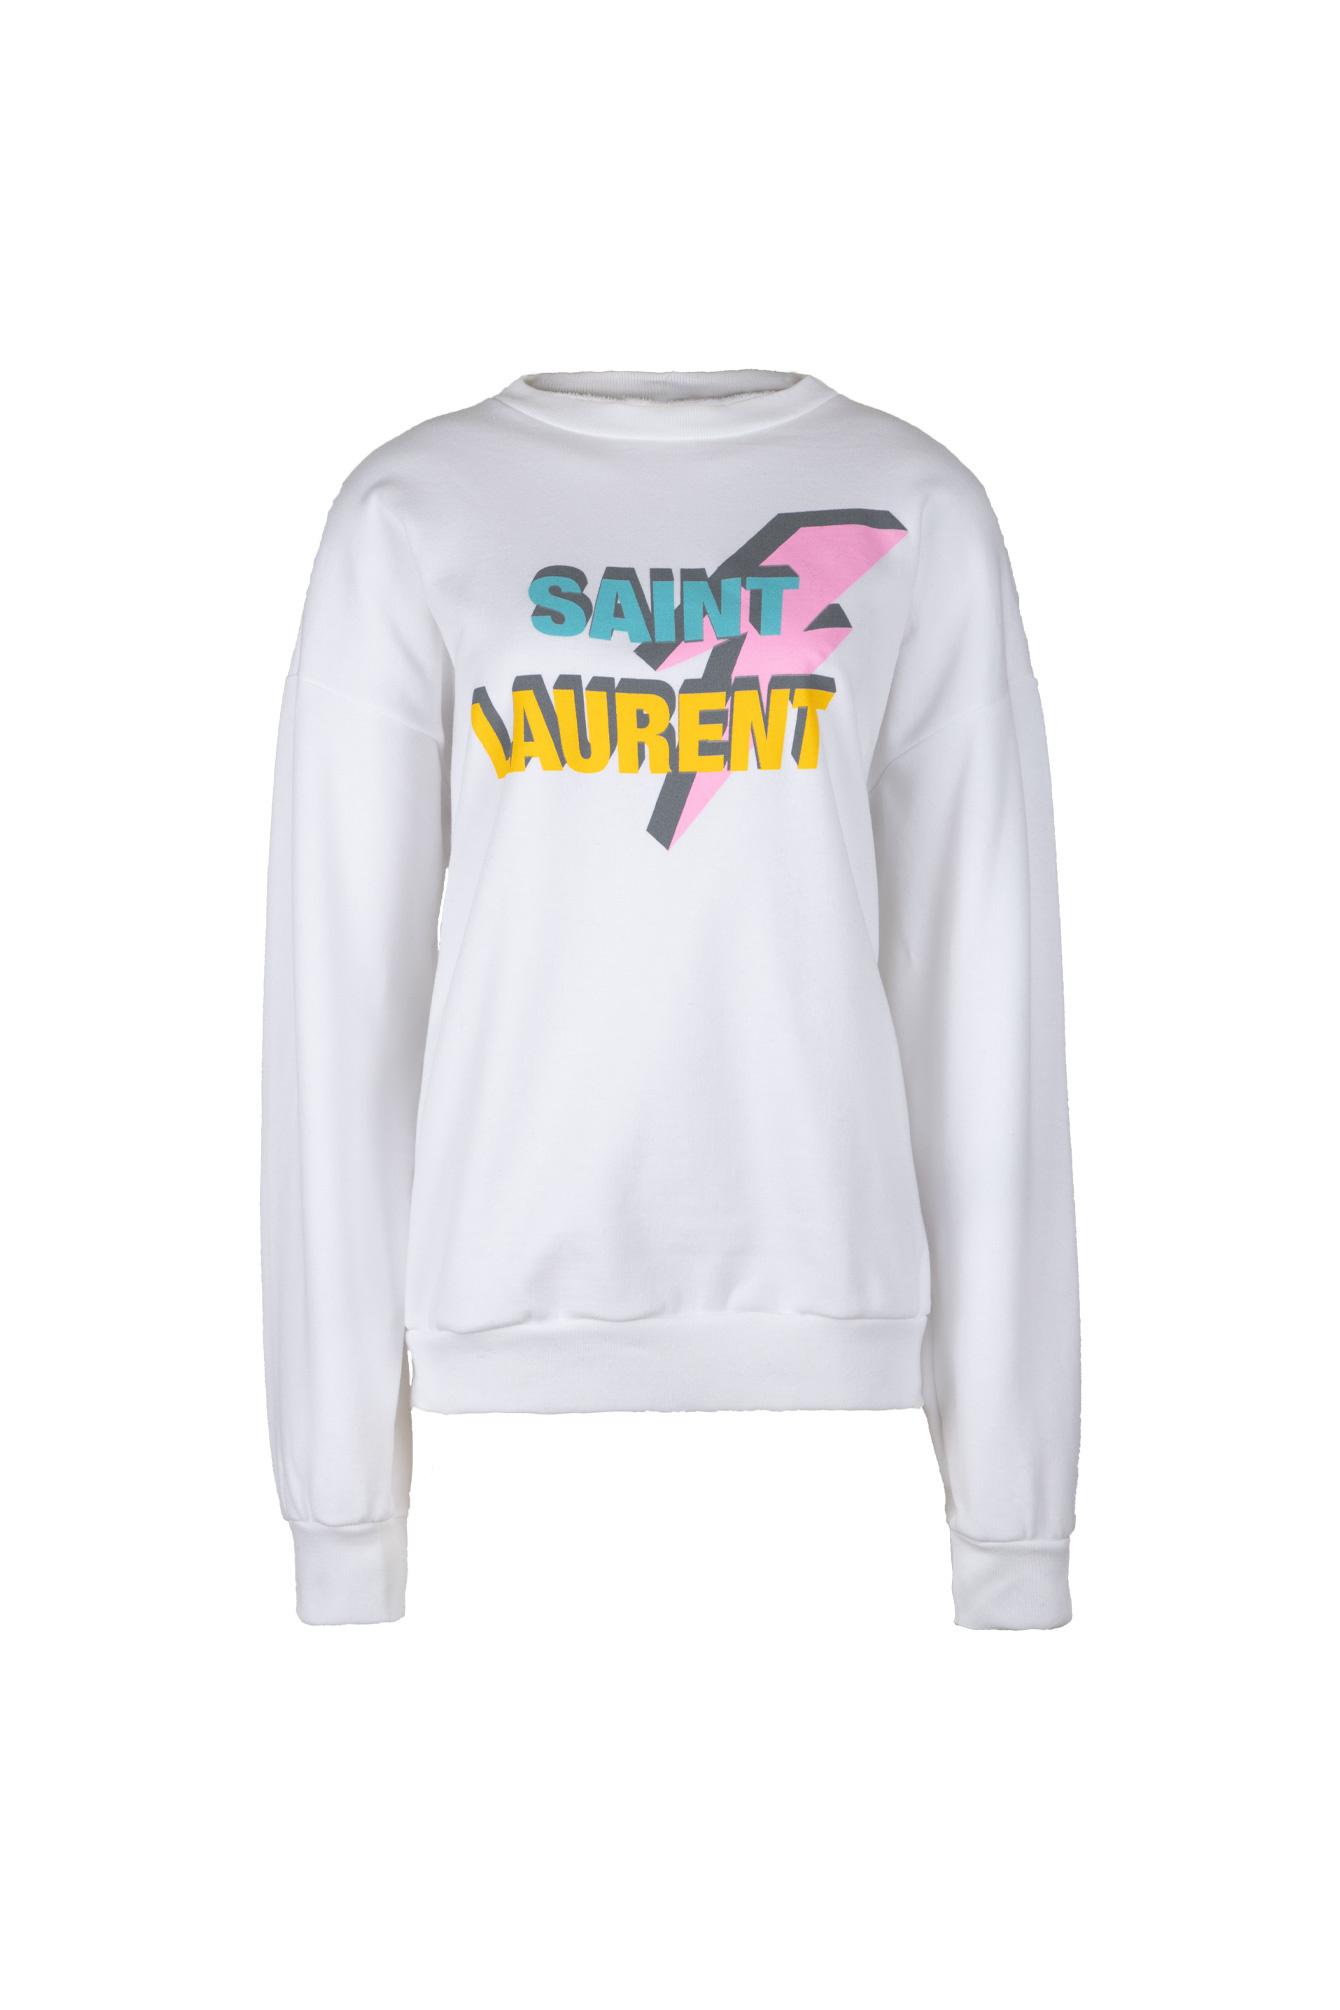 Saint sweater white